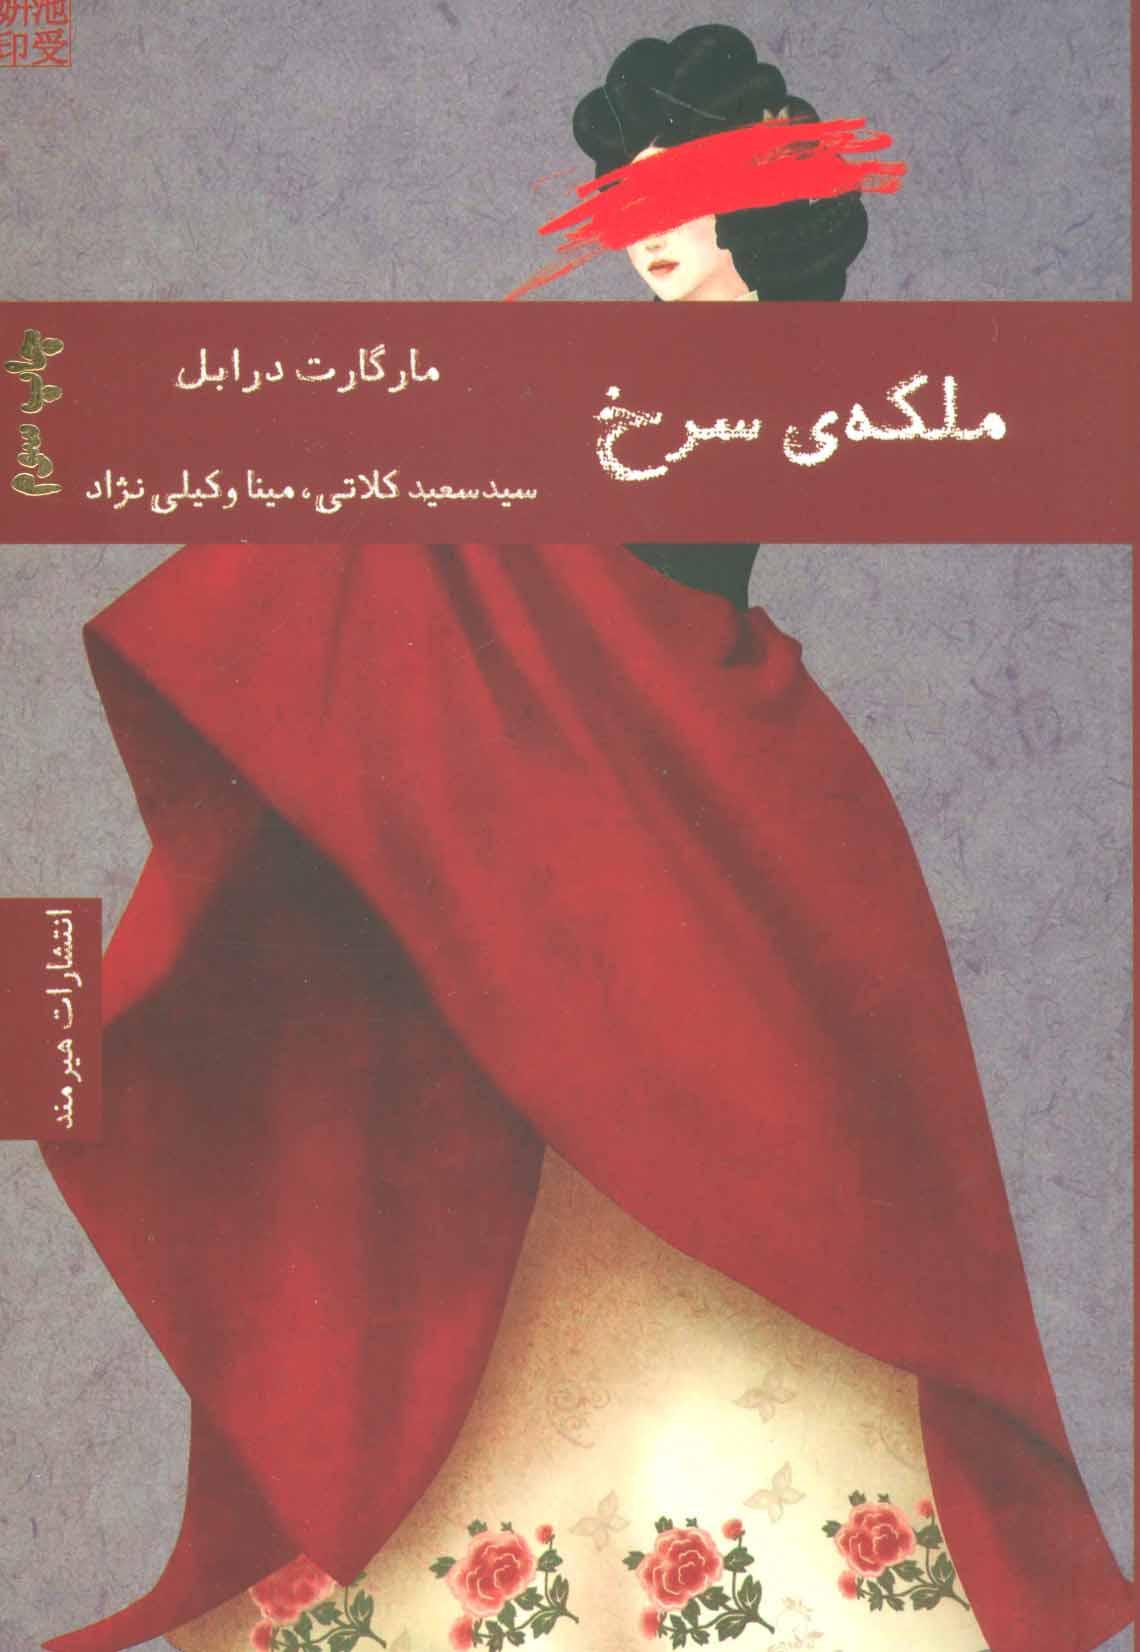 کتاب ملکهٔ سرخ